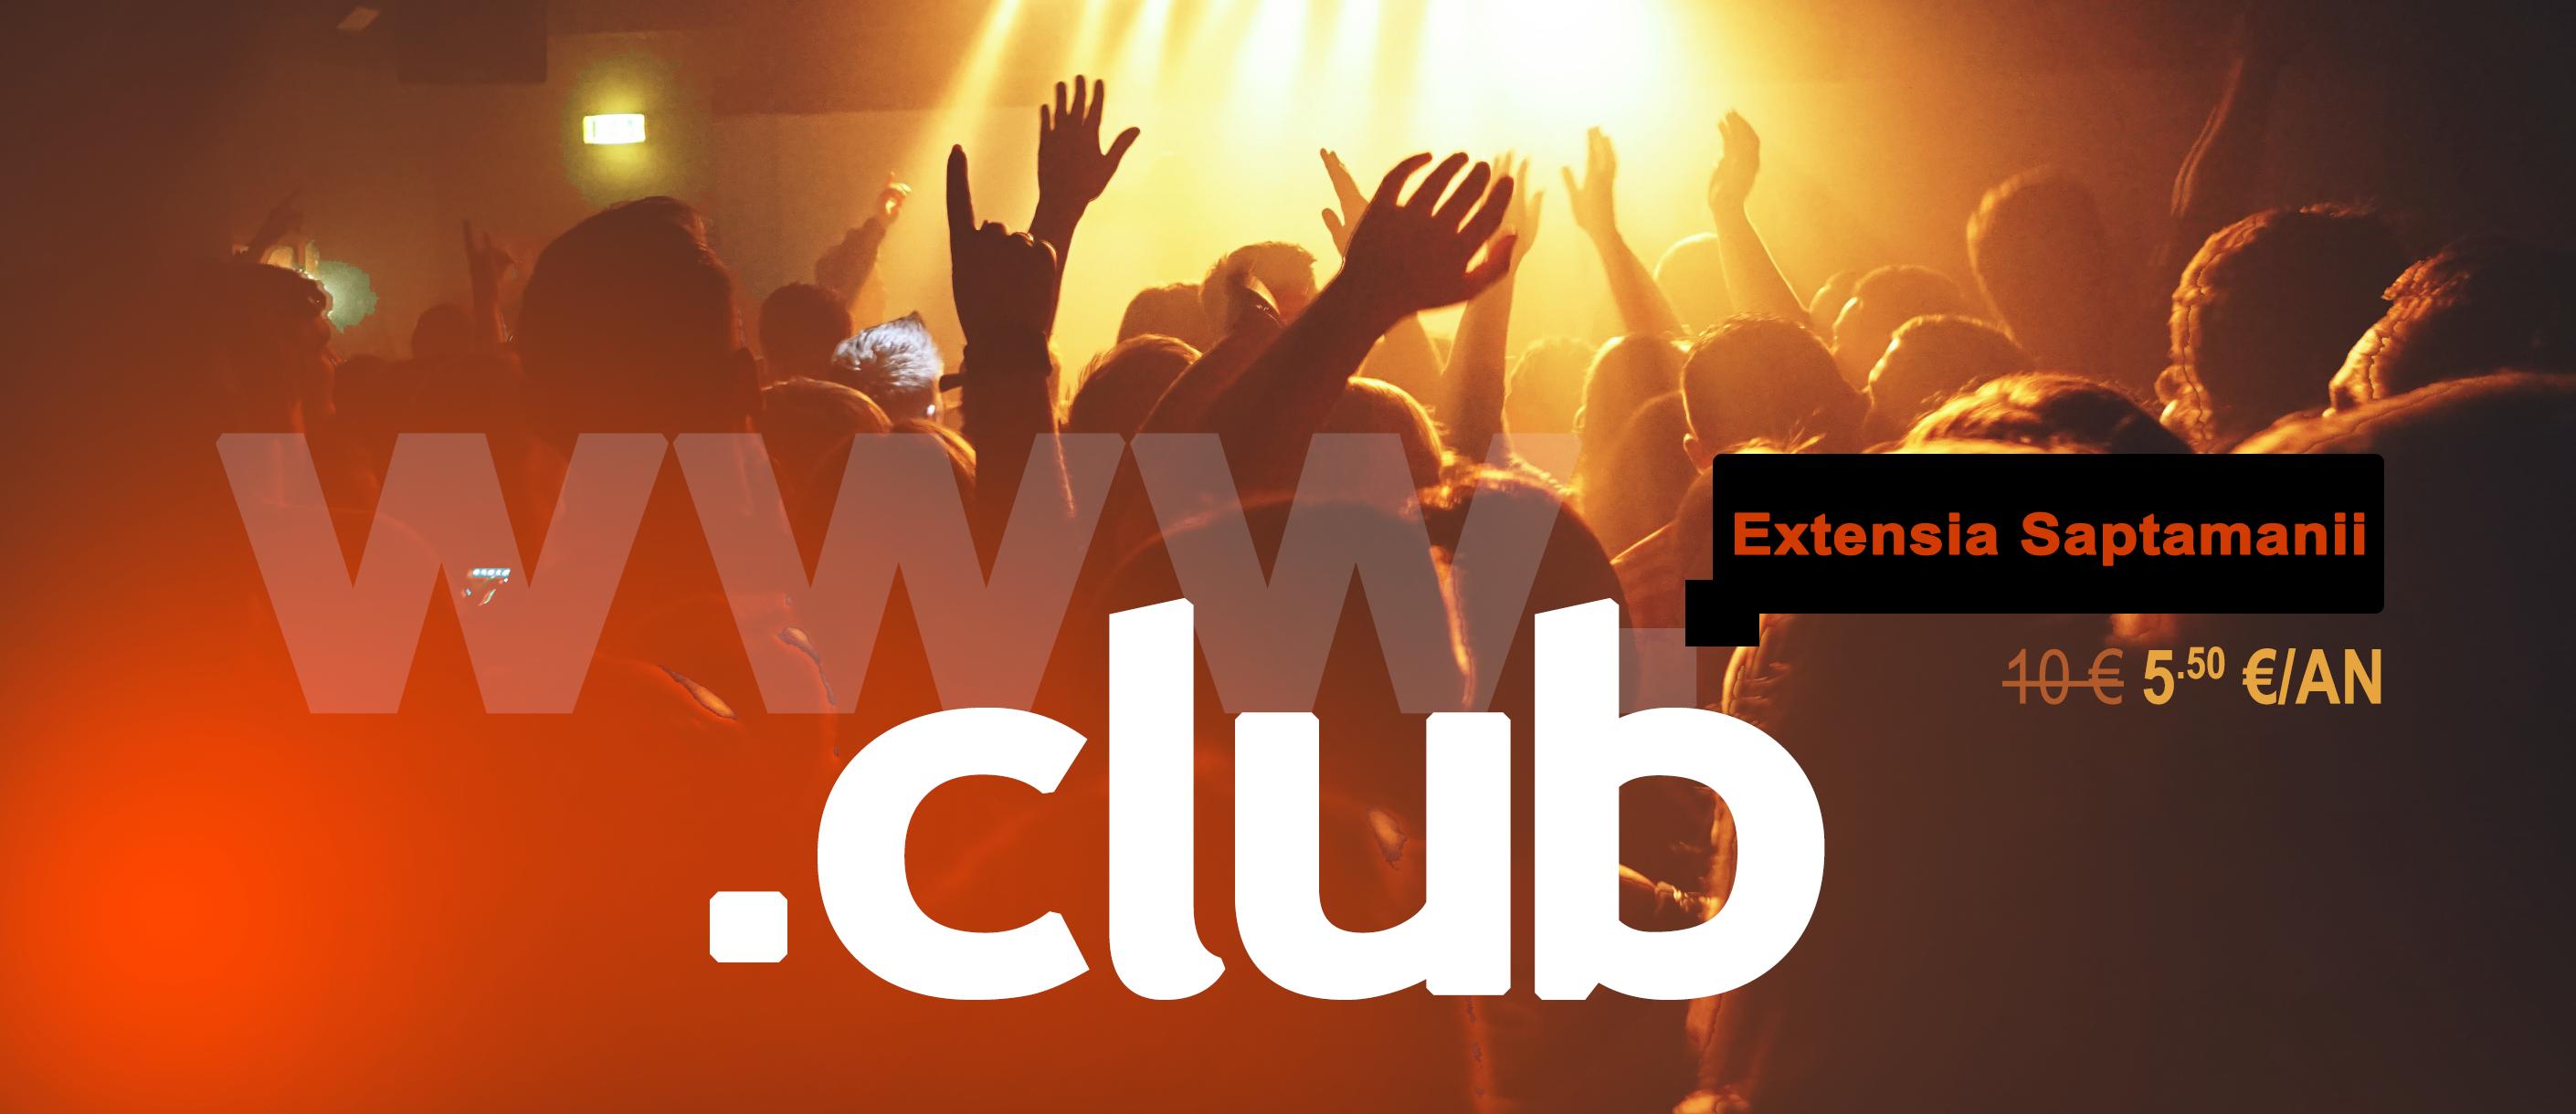 inregistrare domeniu .club